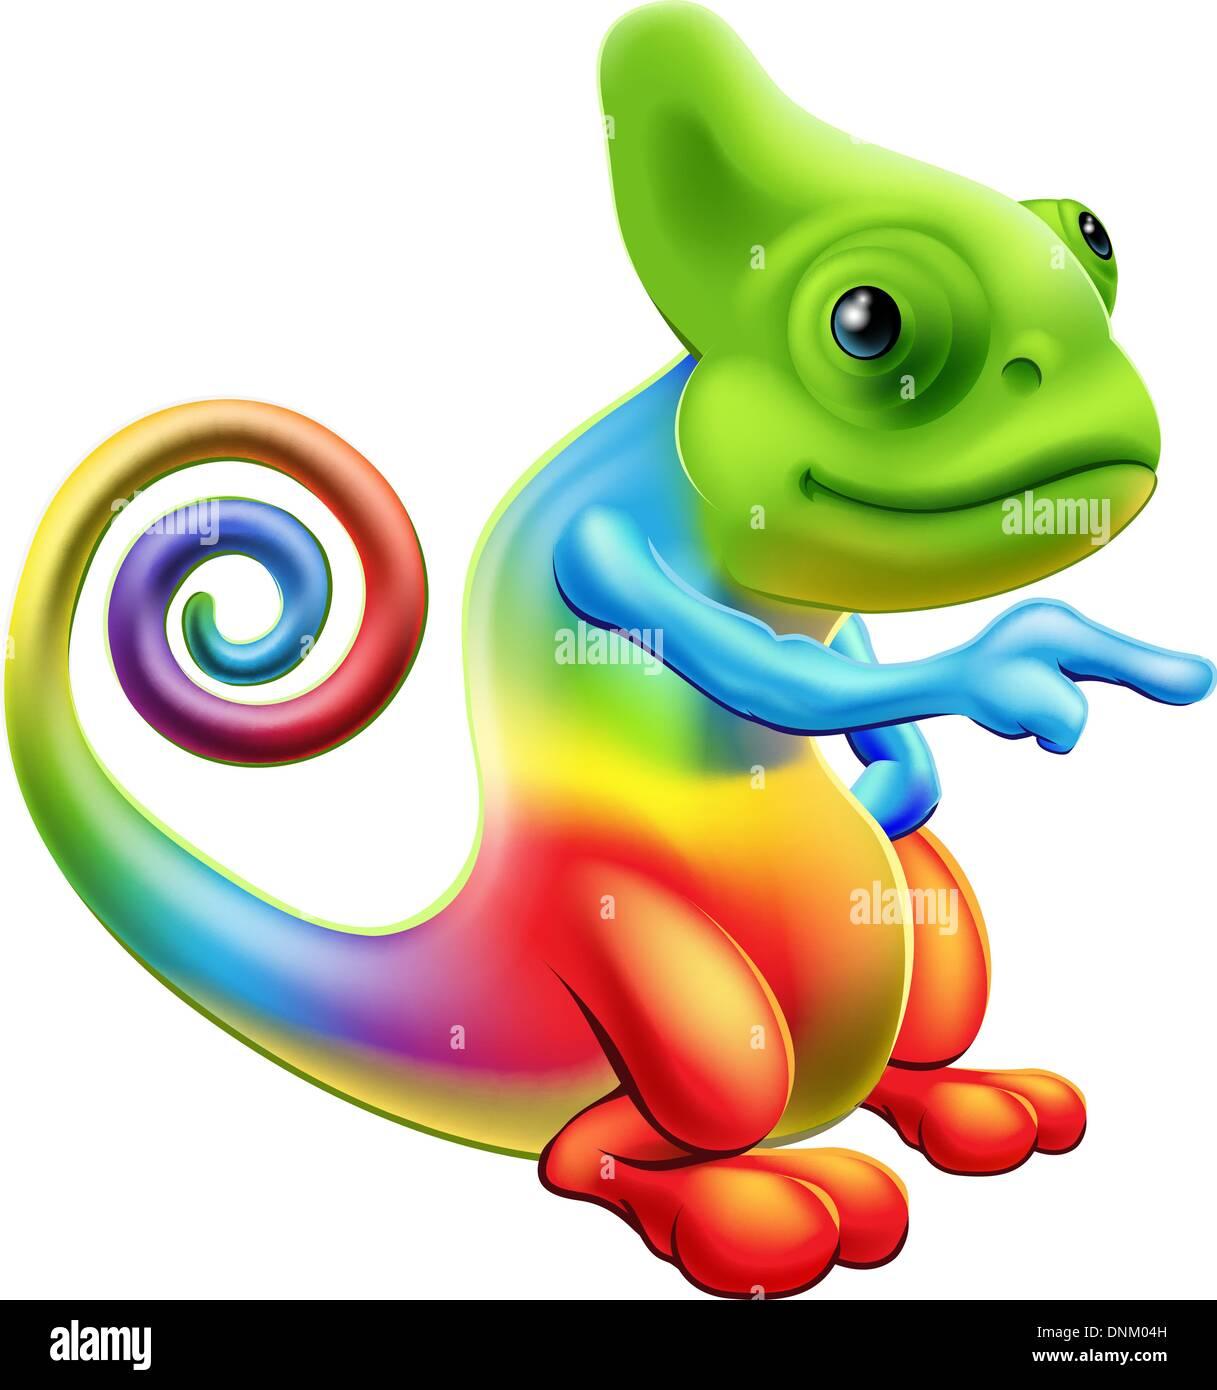 illustration of a cartoon rainbow chameleon mascot standing and rh alamy com chameleon clip art free mixed up chameleon clipart